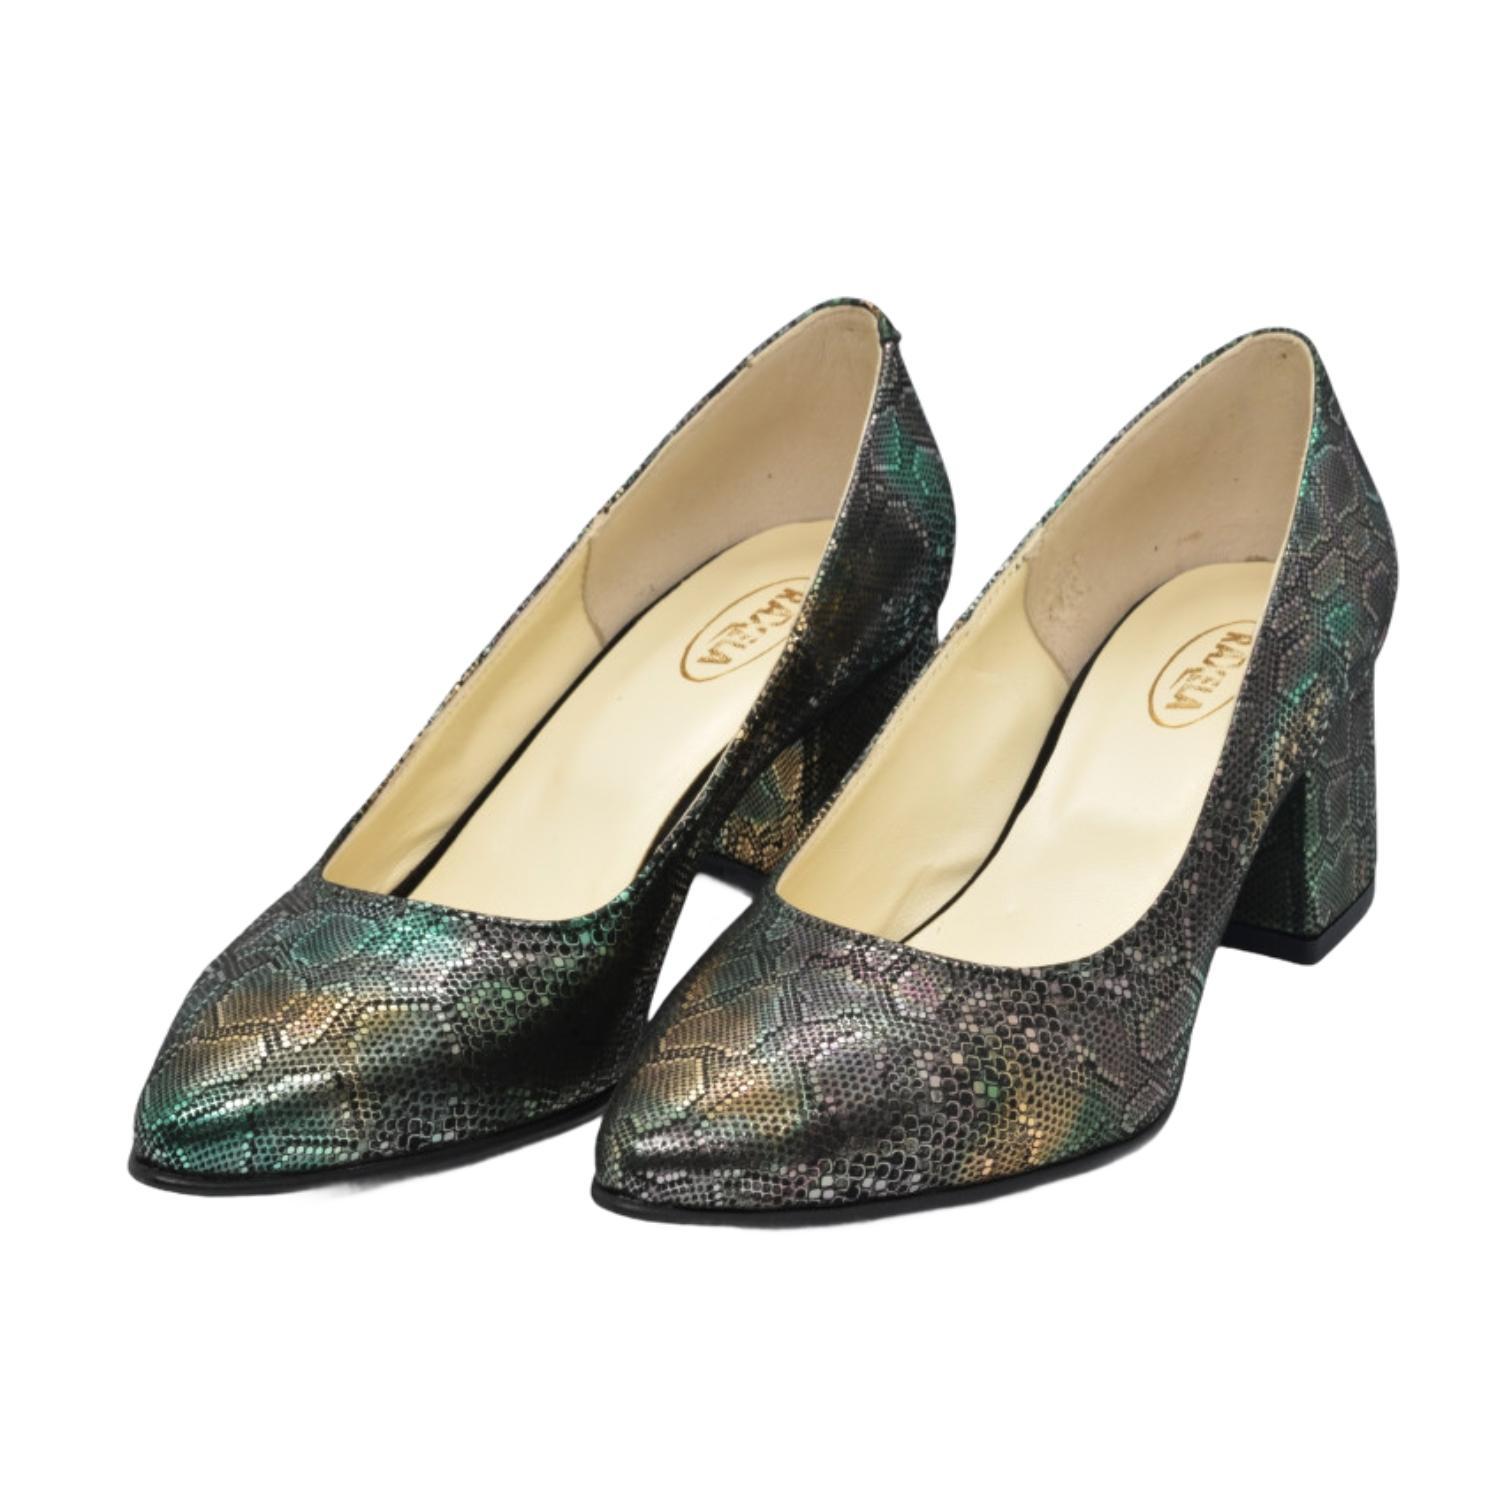 Pantofi verzi cu model abstract